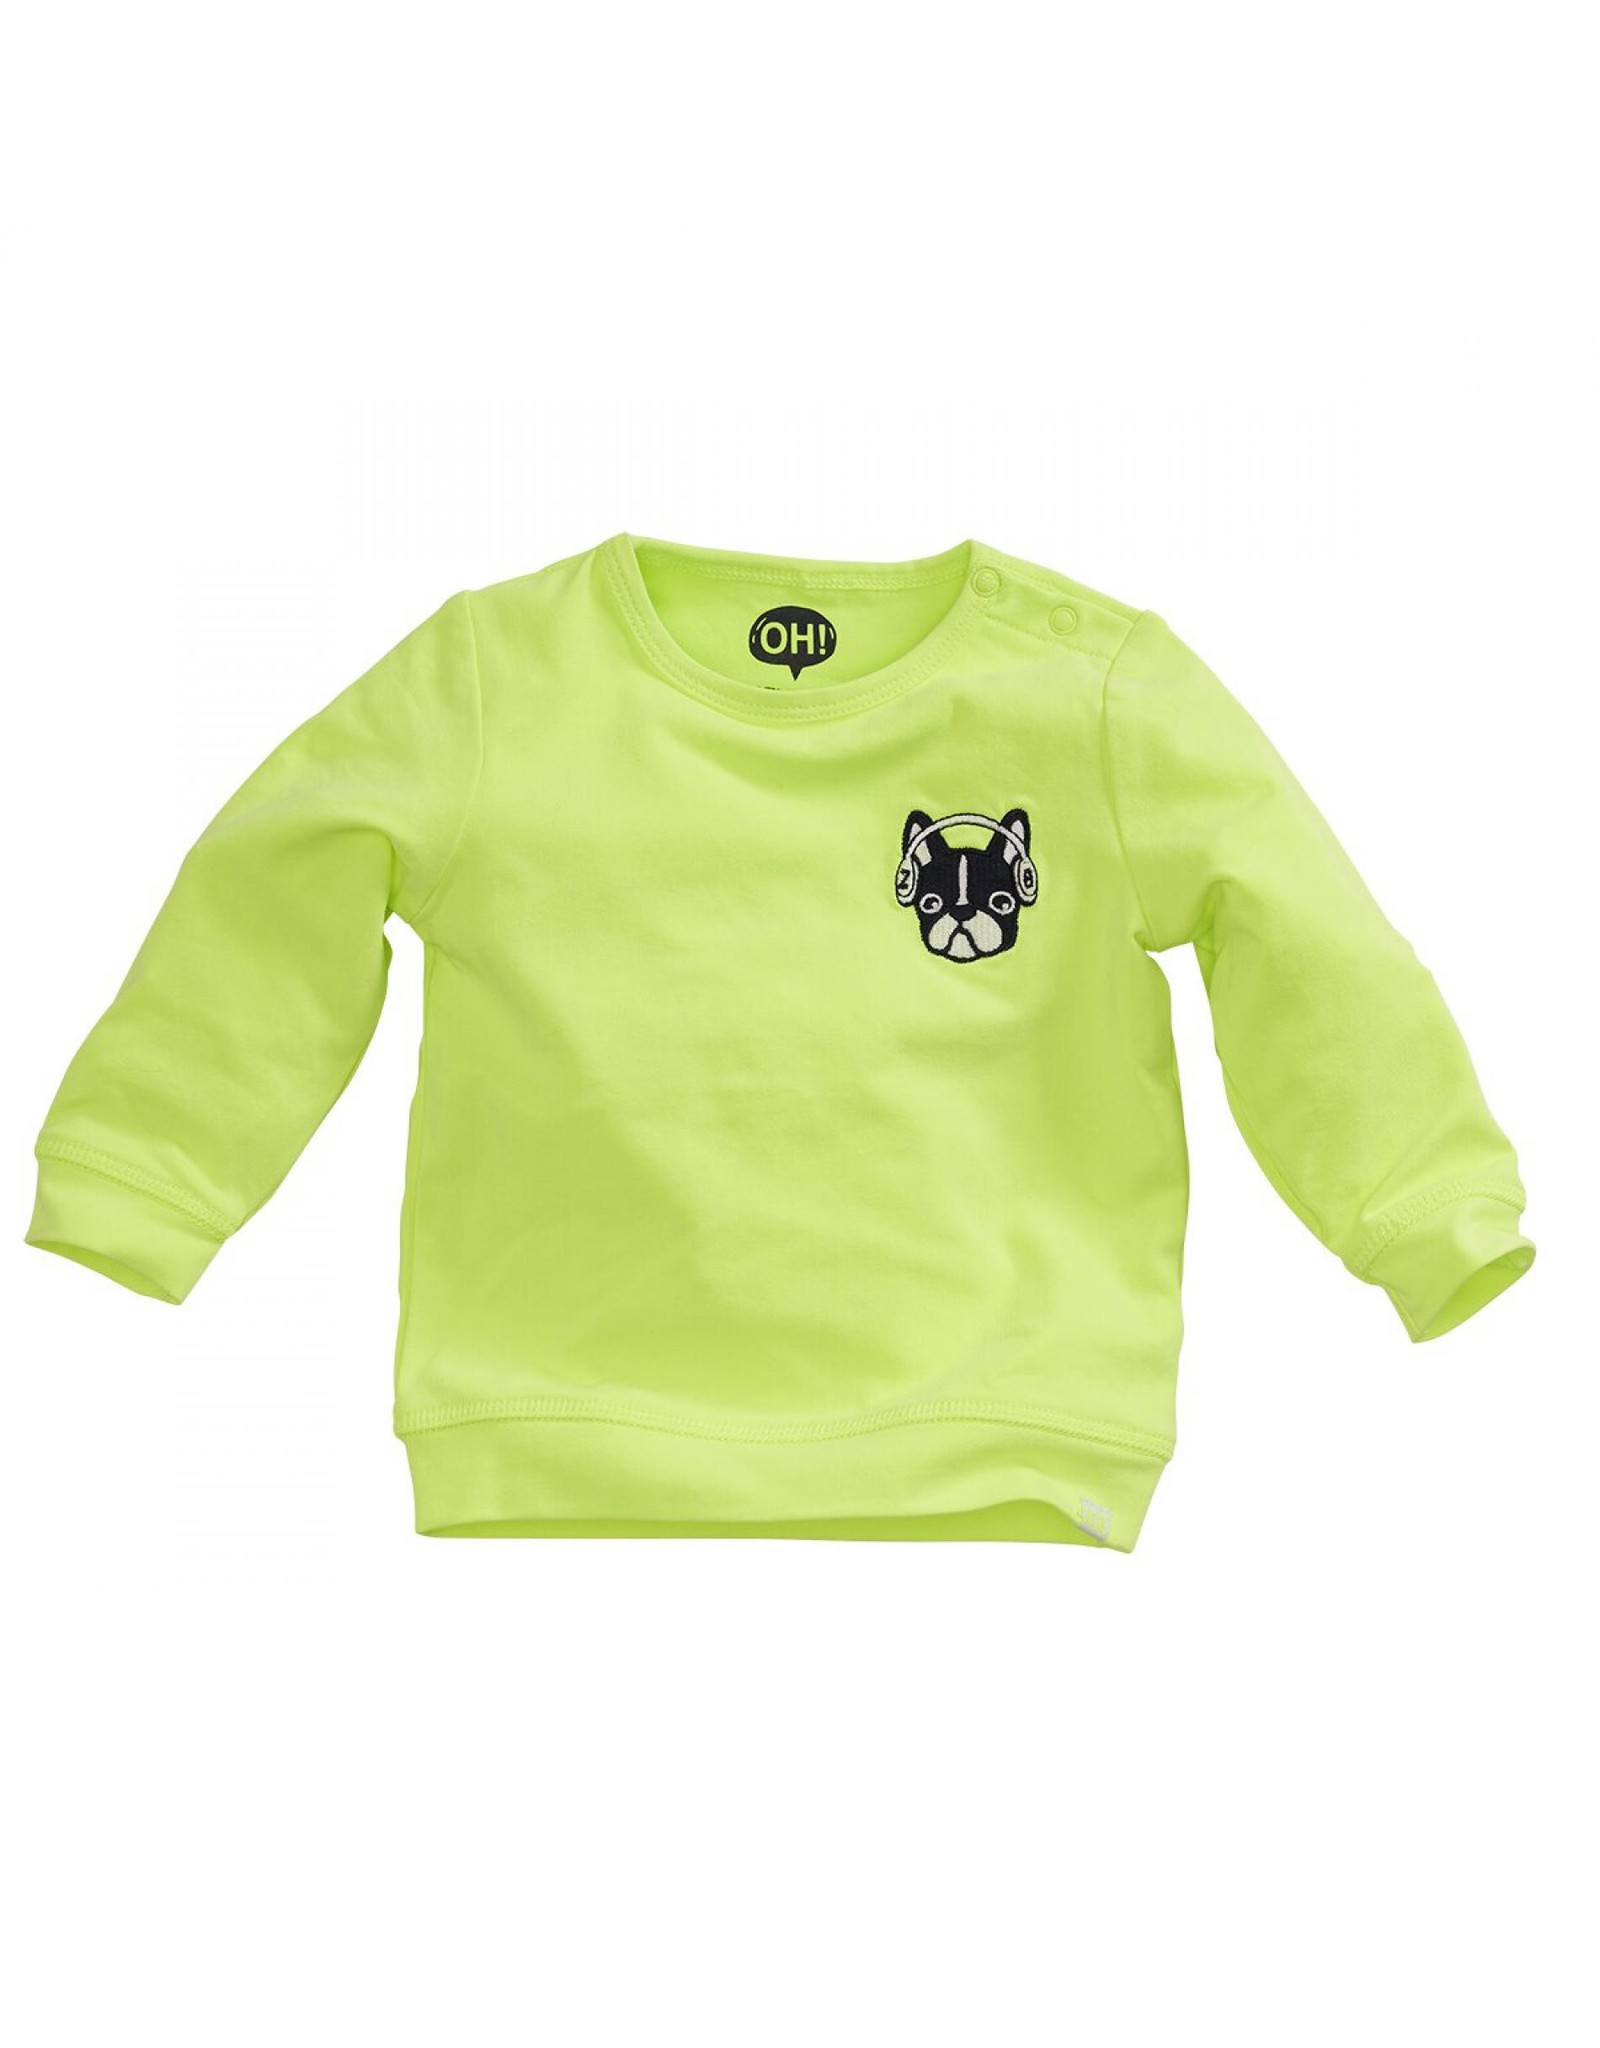 Z8 Dorus sweater